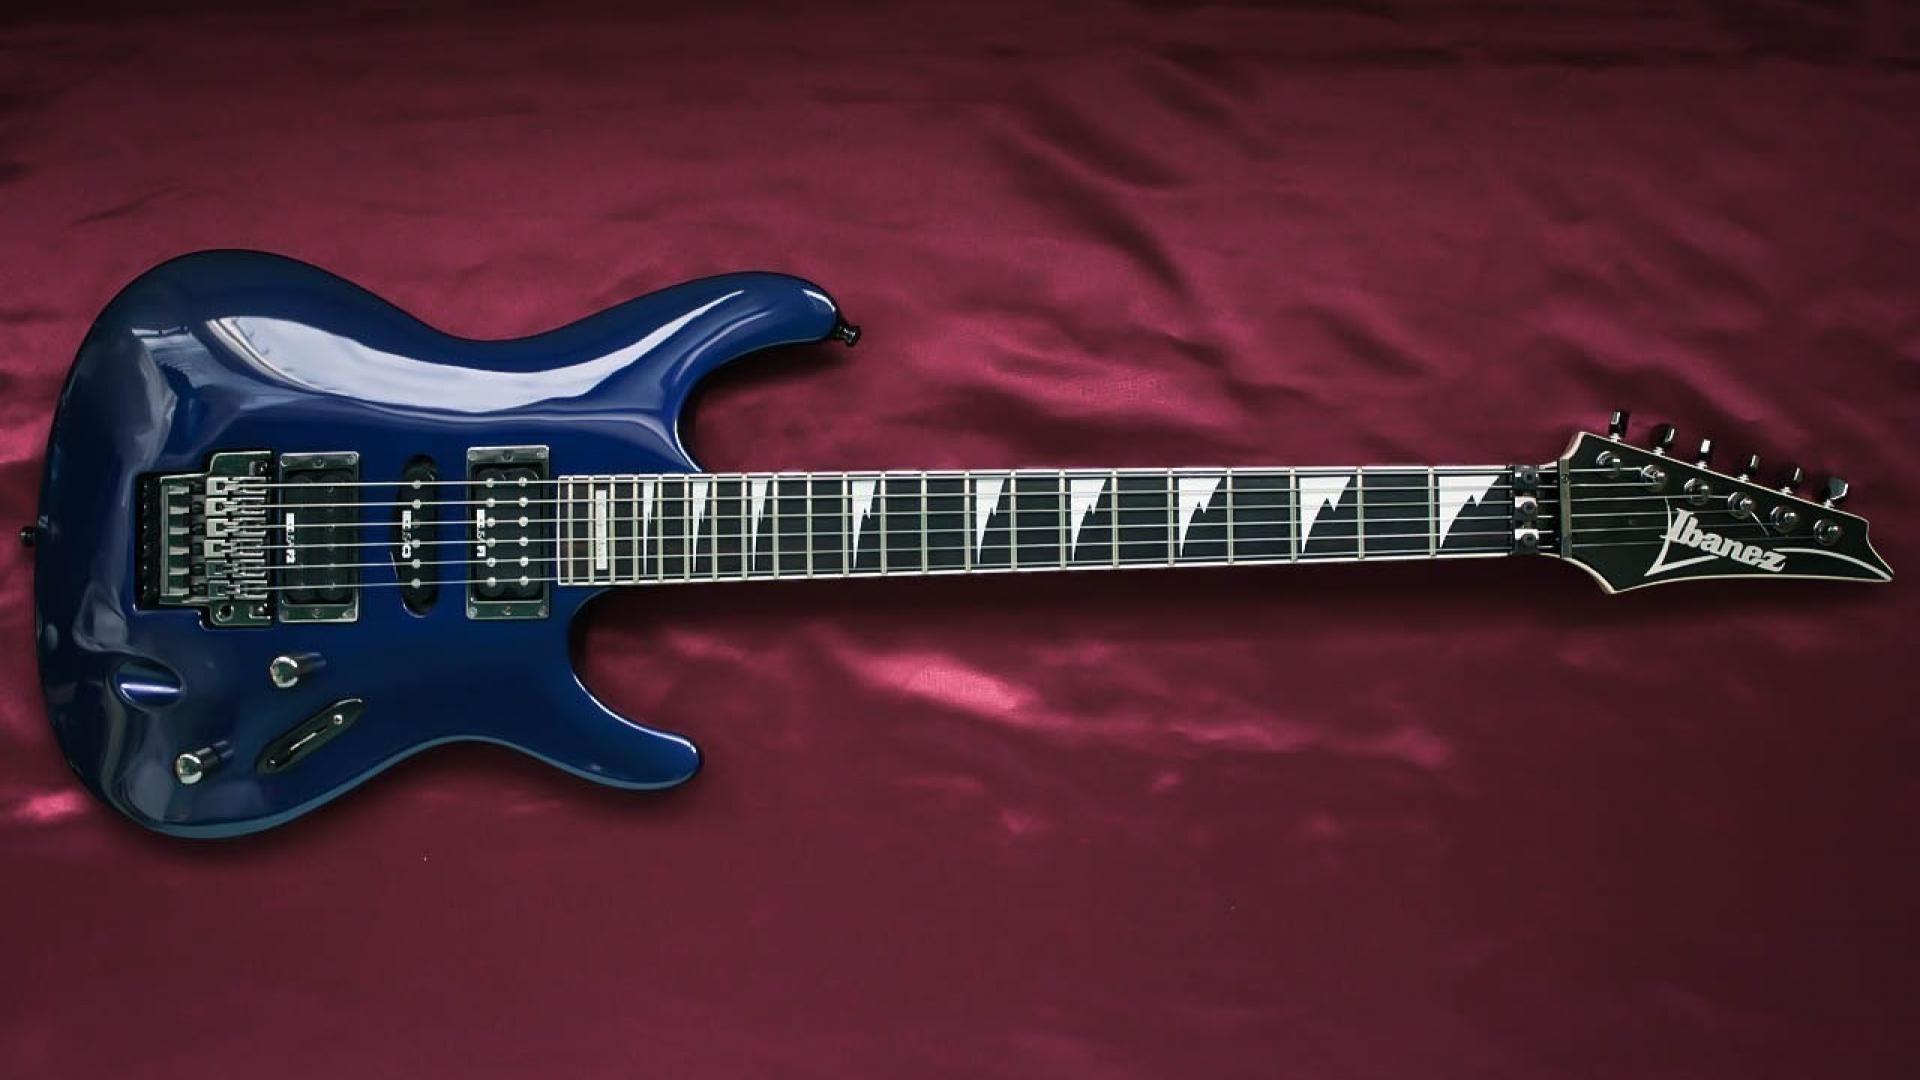 Guitars ibanez wallpaper | (64573)